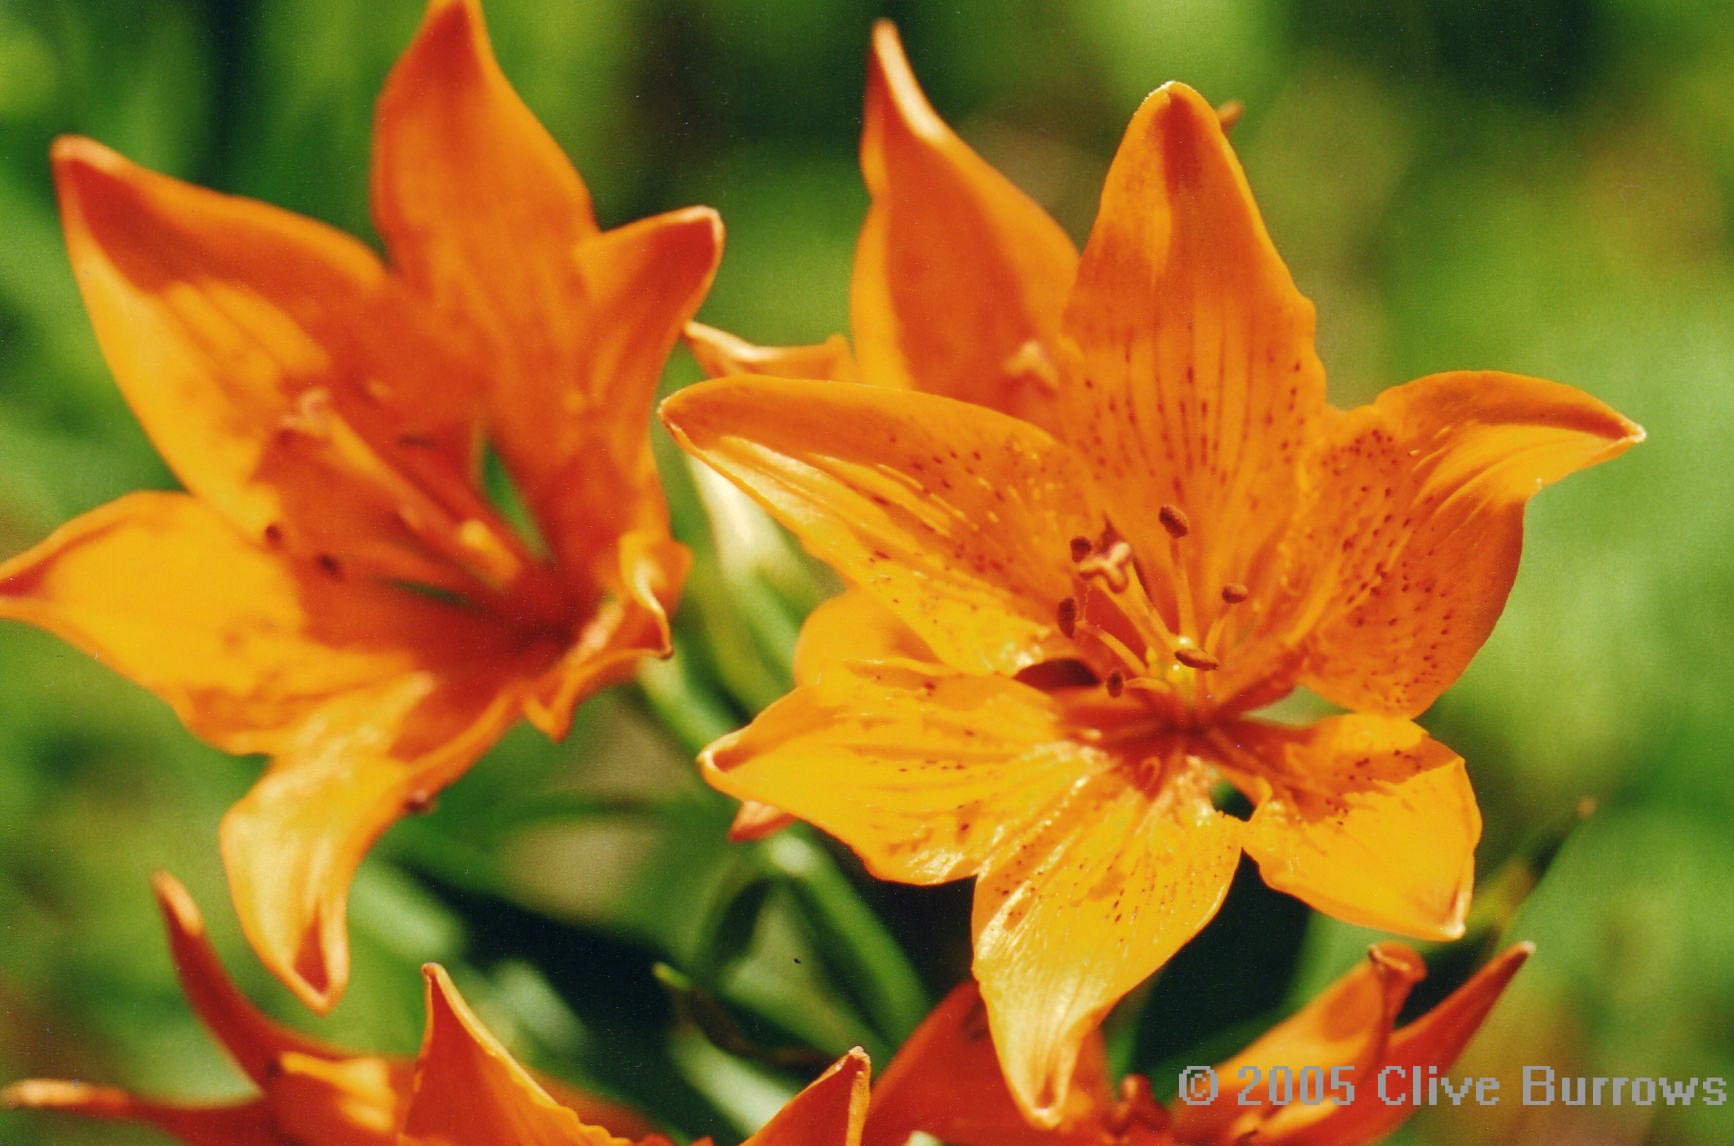 Spanish pyrenees wildlife buterflies etc pyrenees spain lily izmirmasajfo Image collections